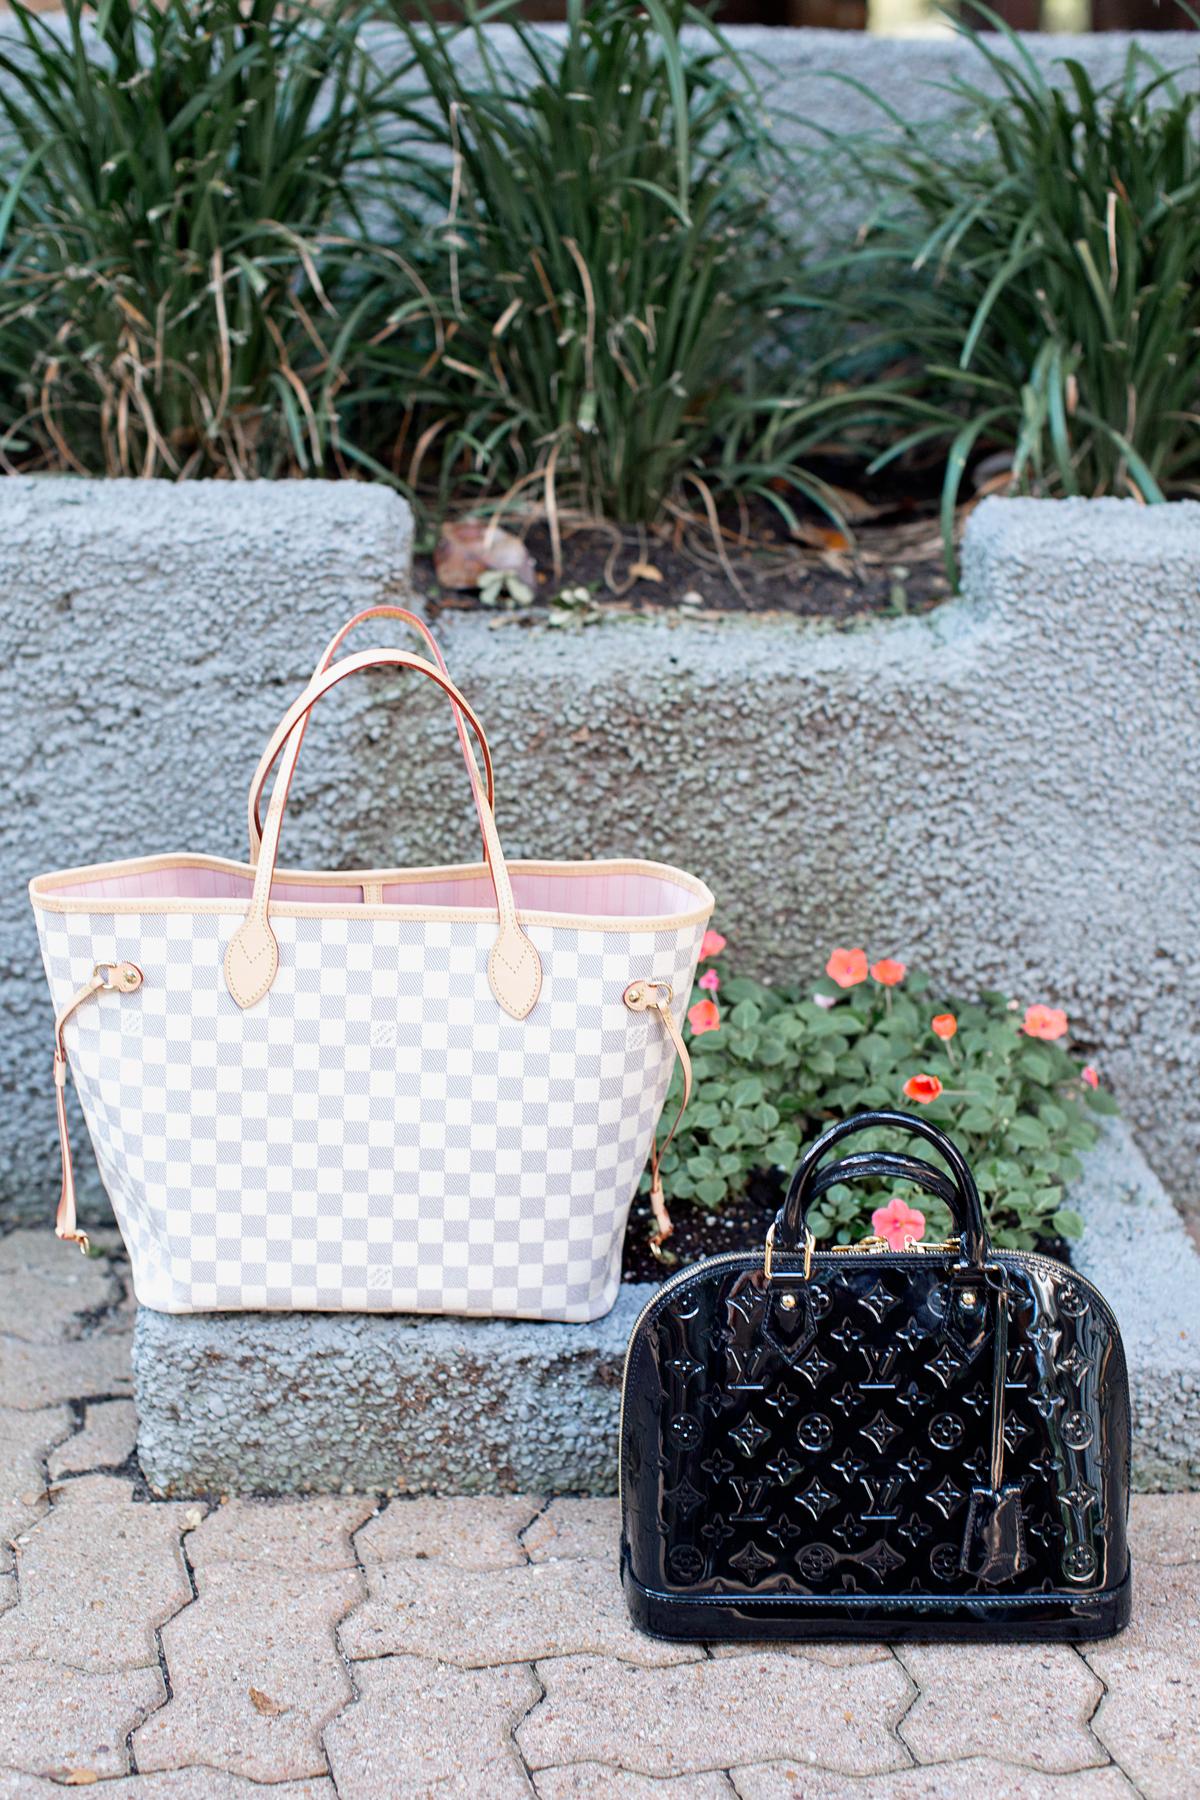 two designer handbags sitting on the ground